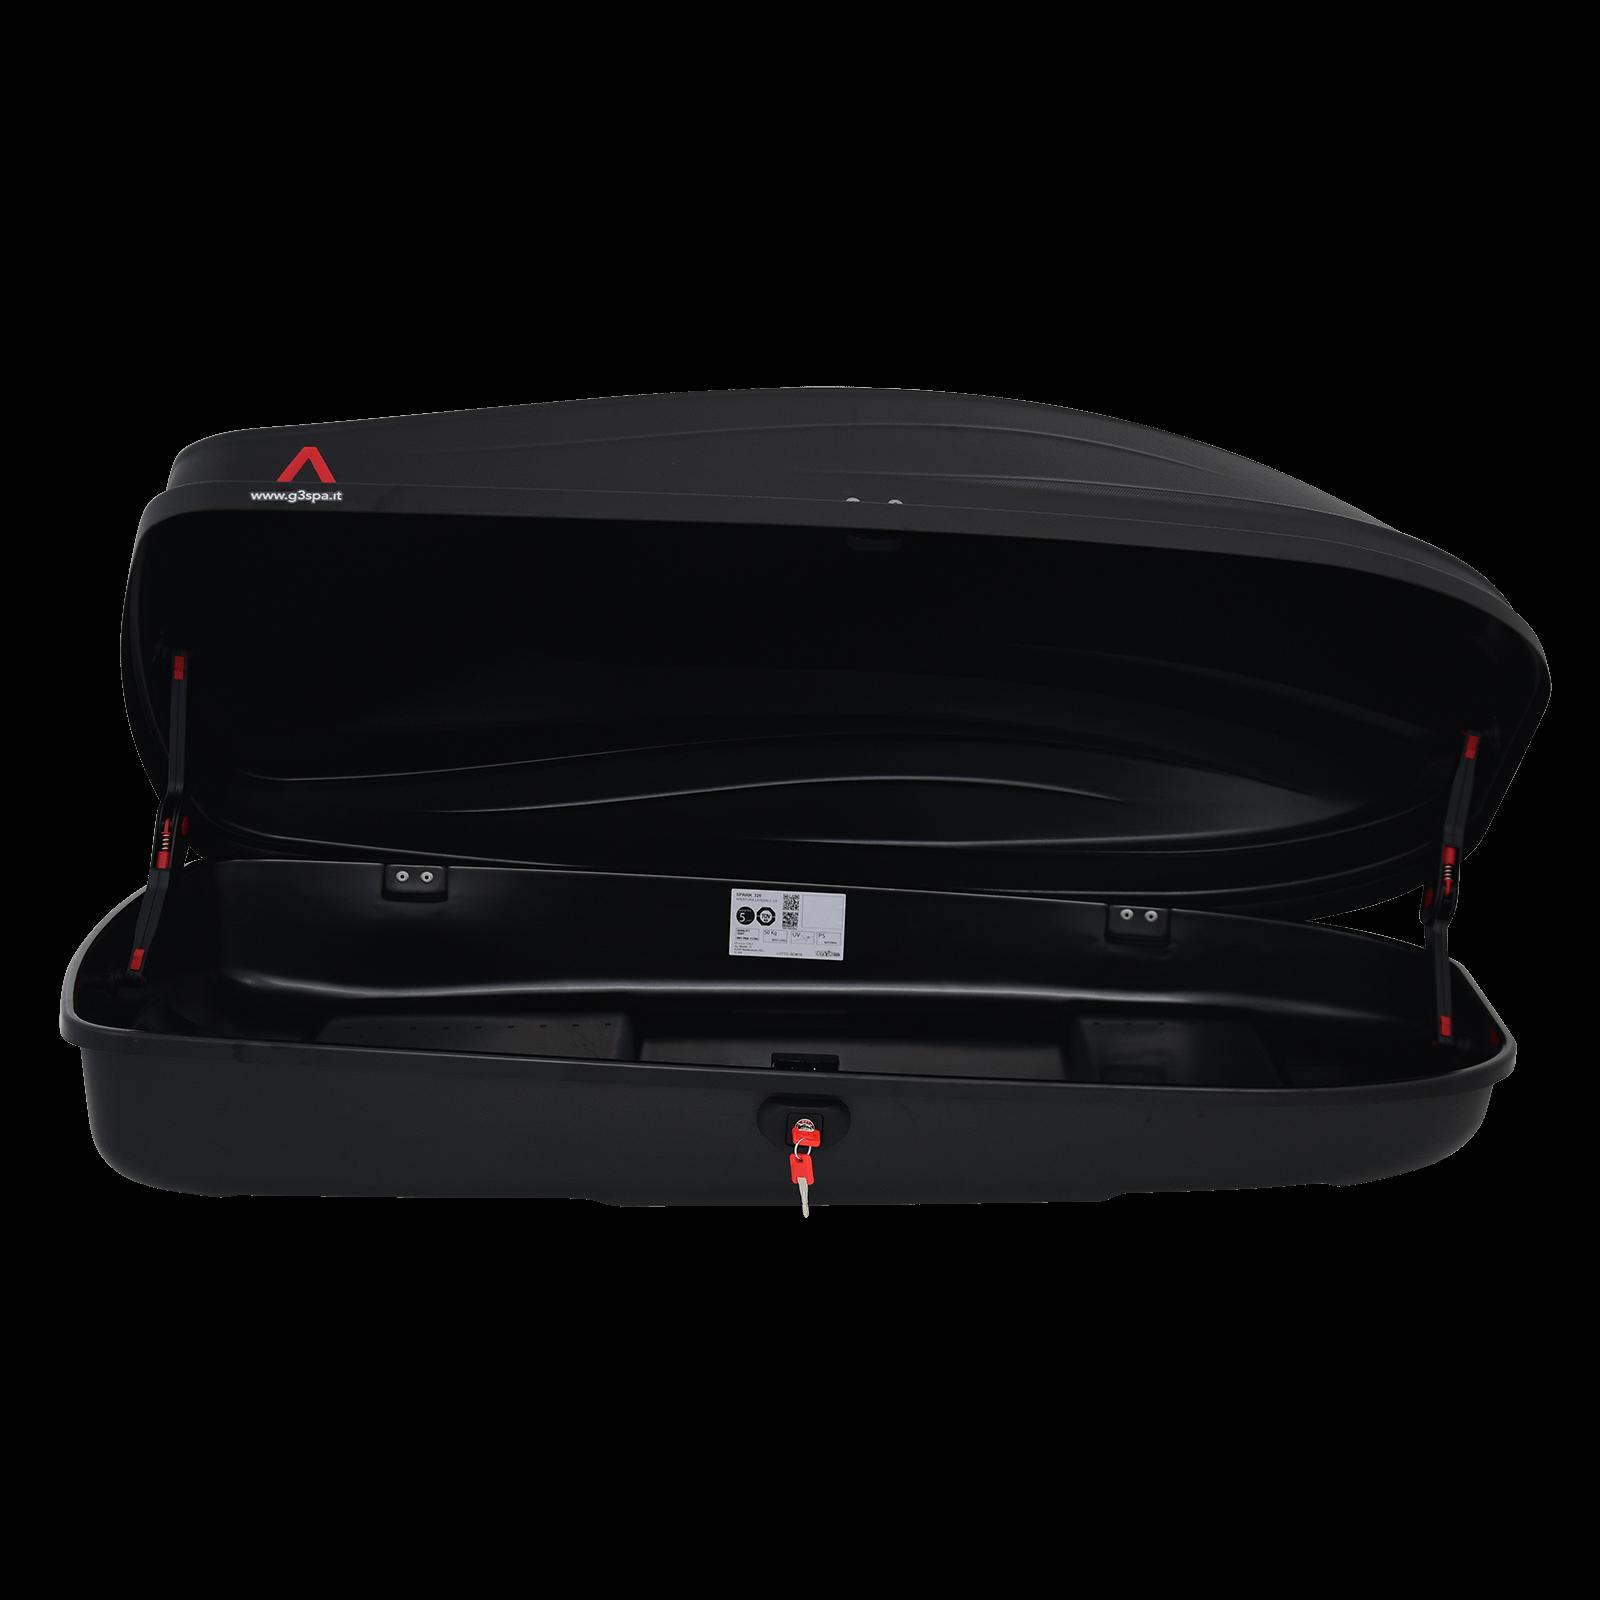 Dachbox G3 Spark 320 schwarz matt - Bild 2